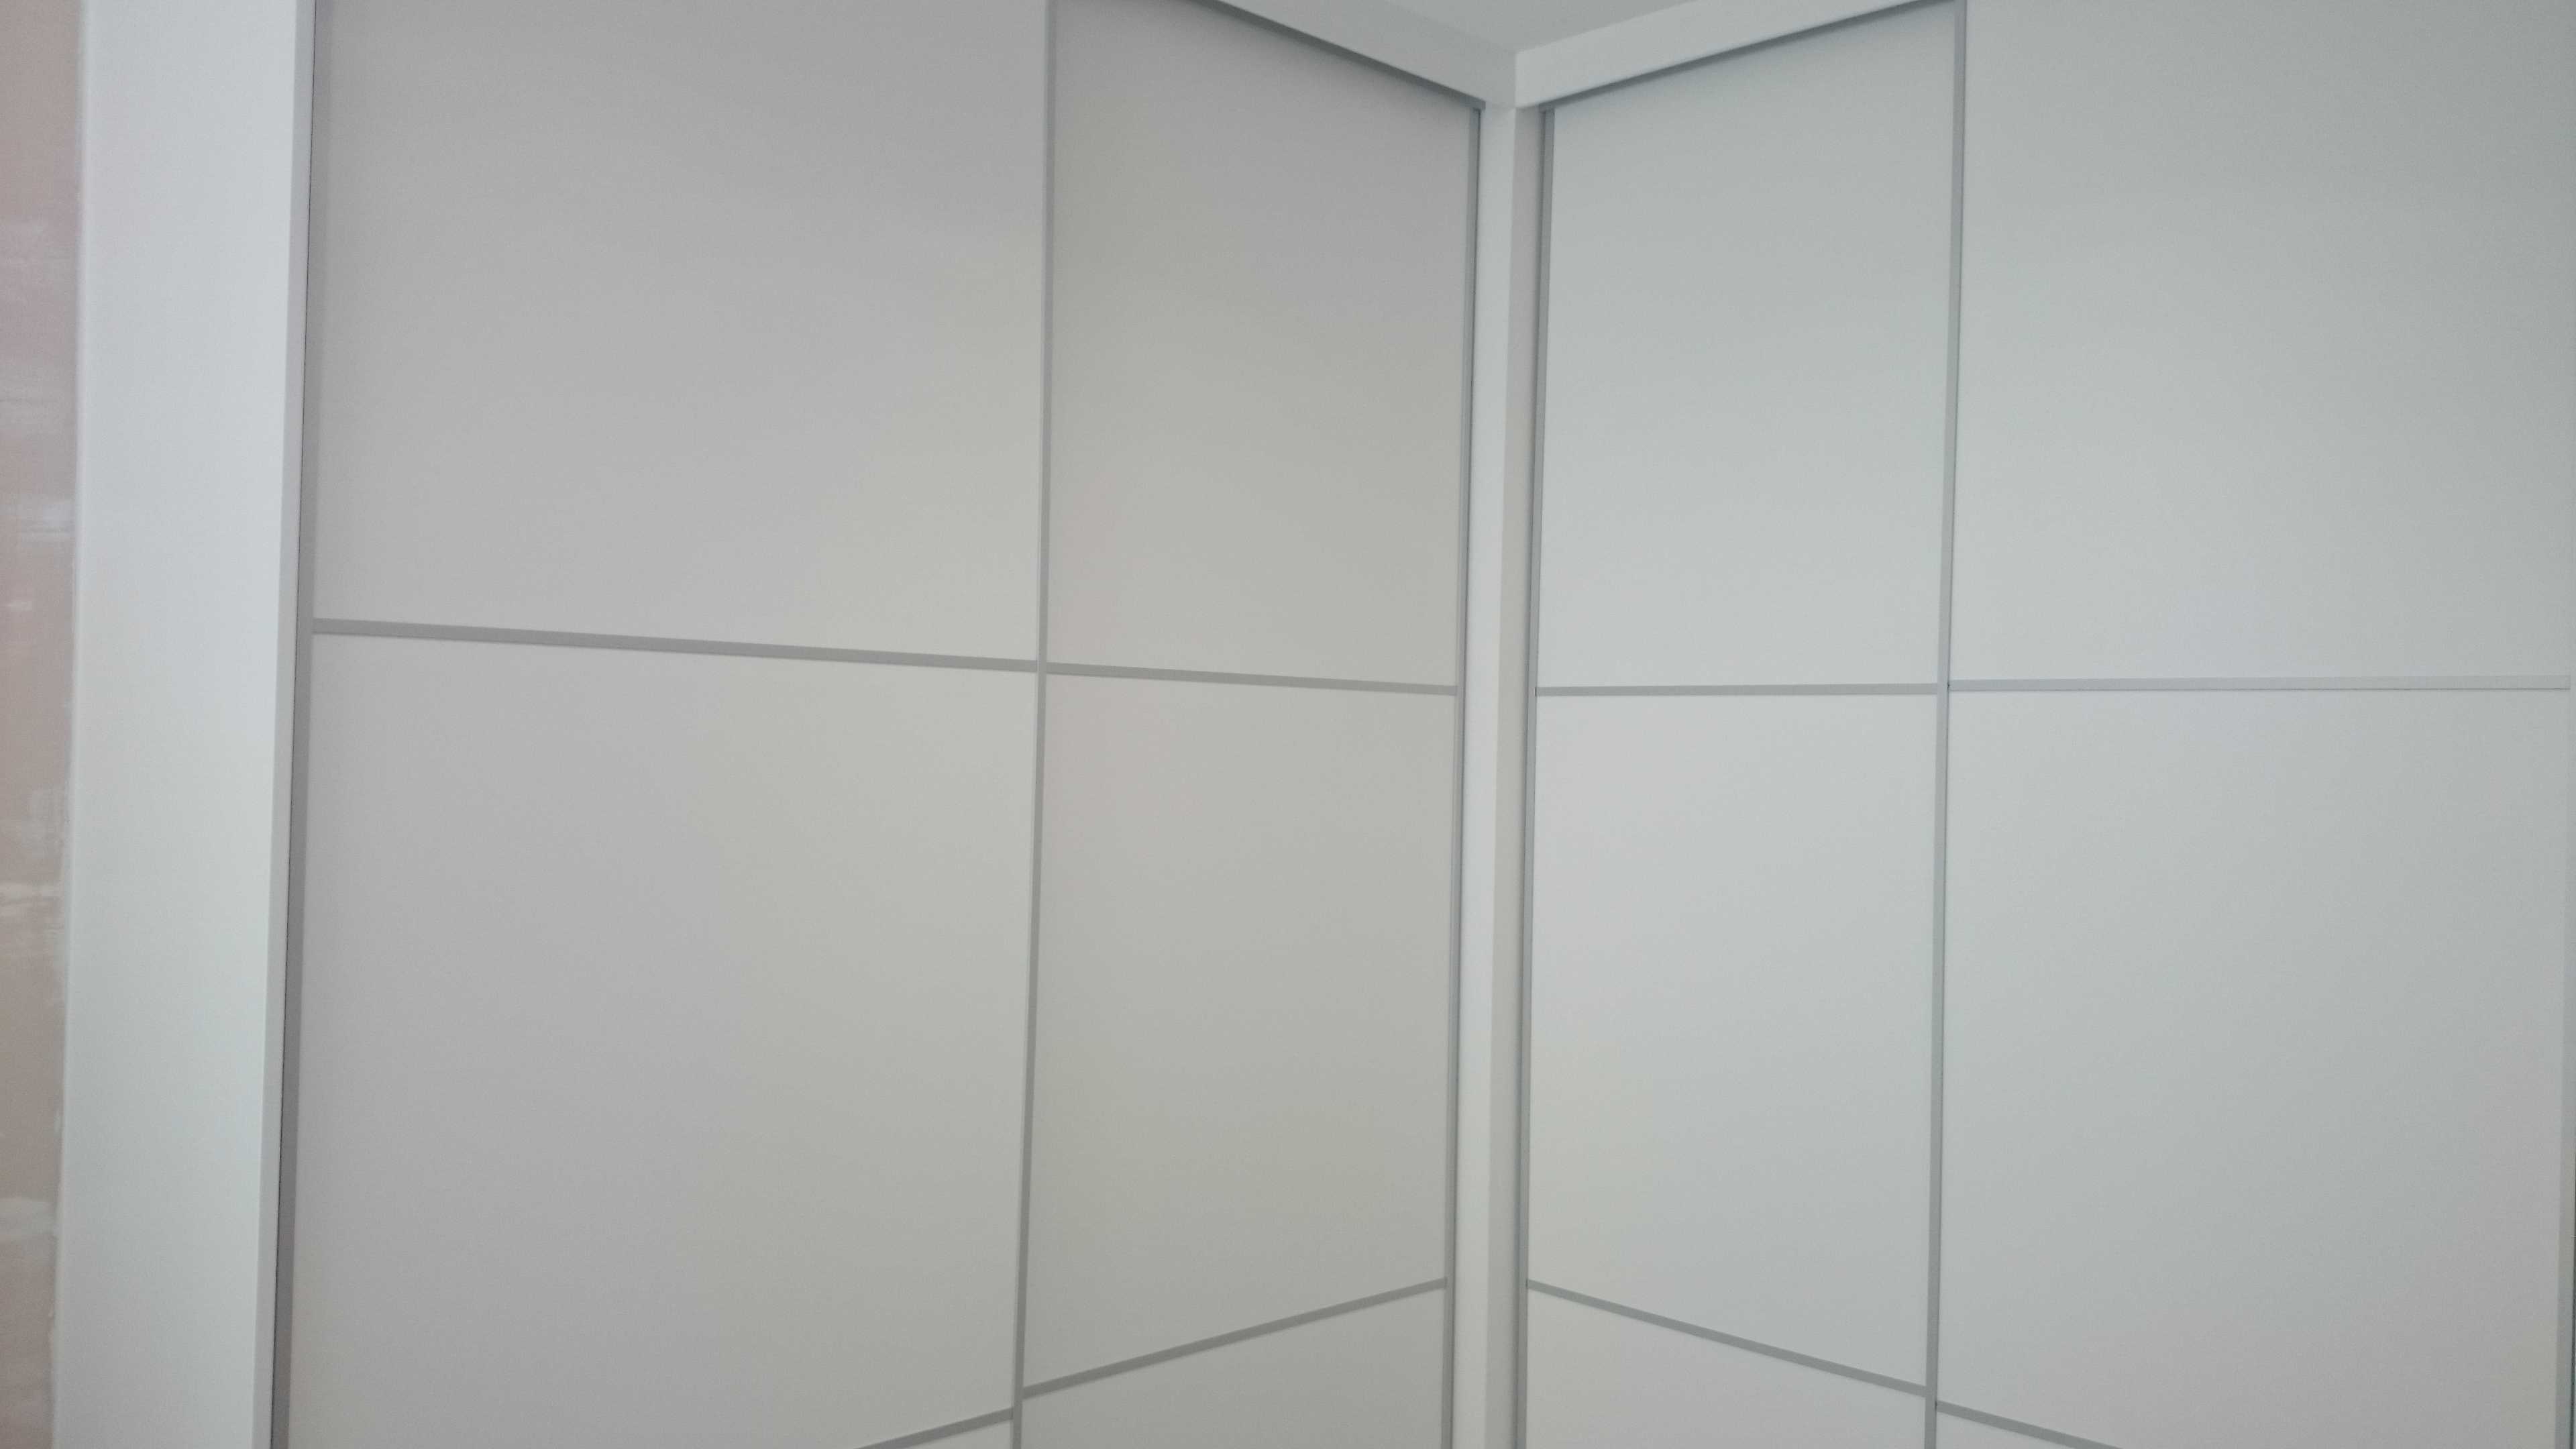 Carpinter a familia murcia armario lacado en blanco de - Carpinteria de aluminio murcia ...